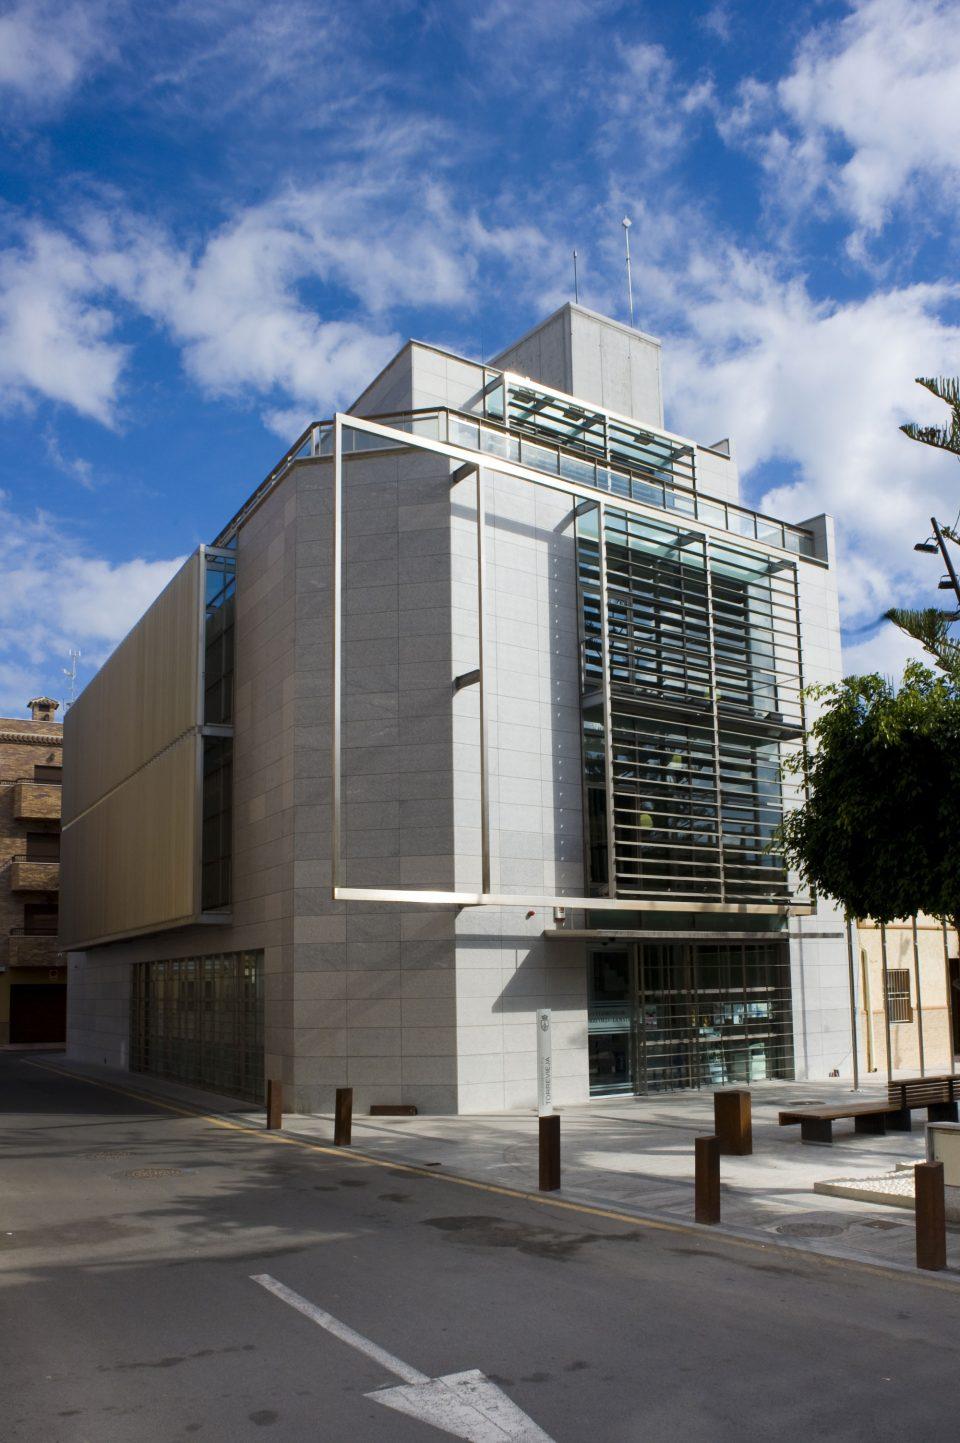 La OMIC de Torrevieja se traslada al ayuntamiento periférico de La Mata 6